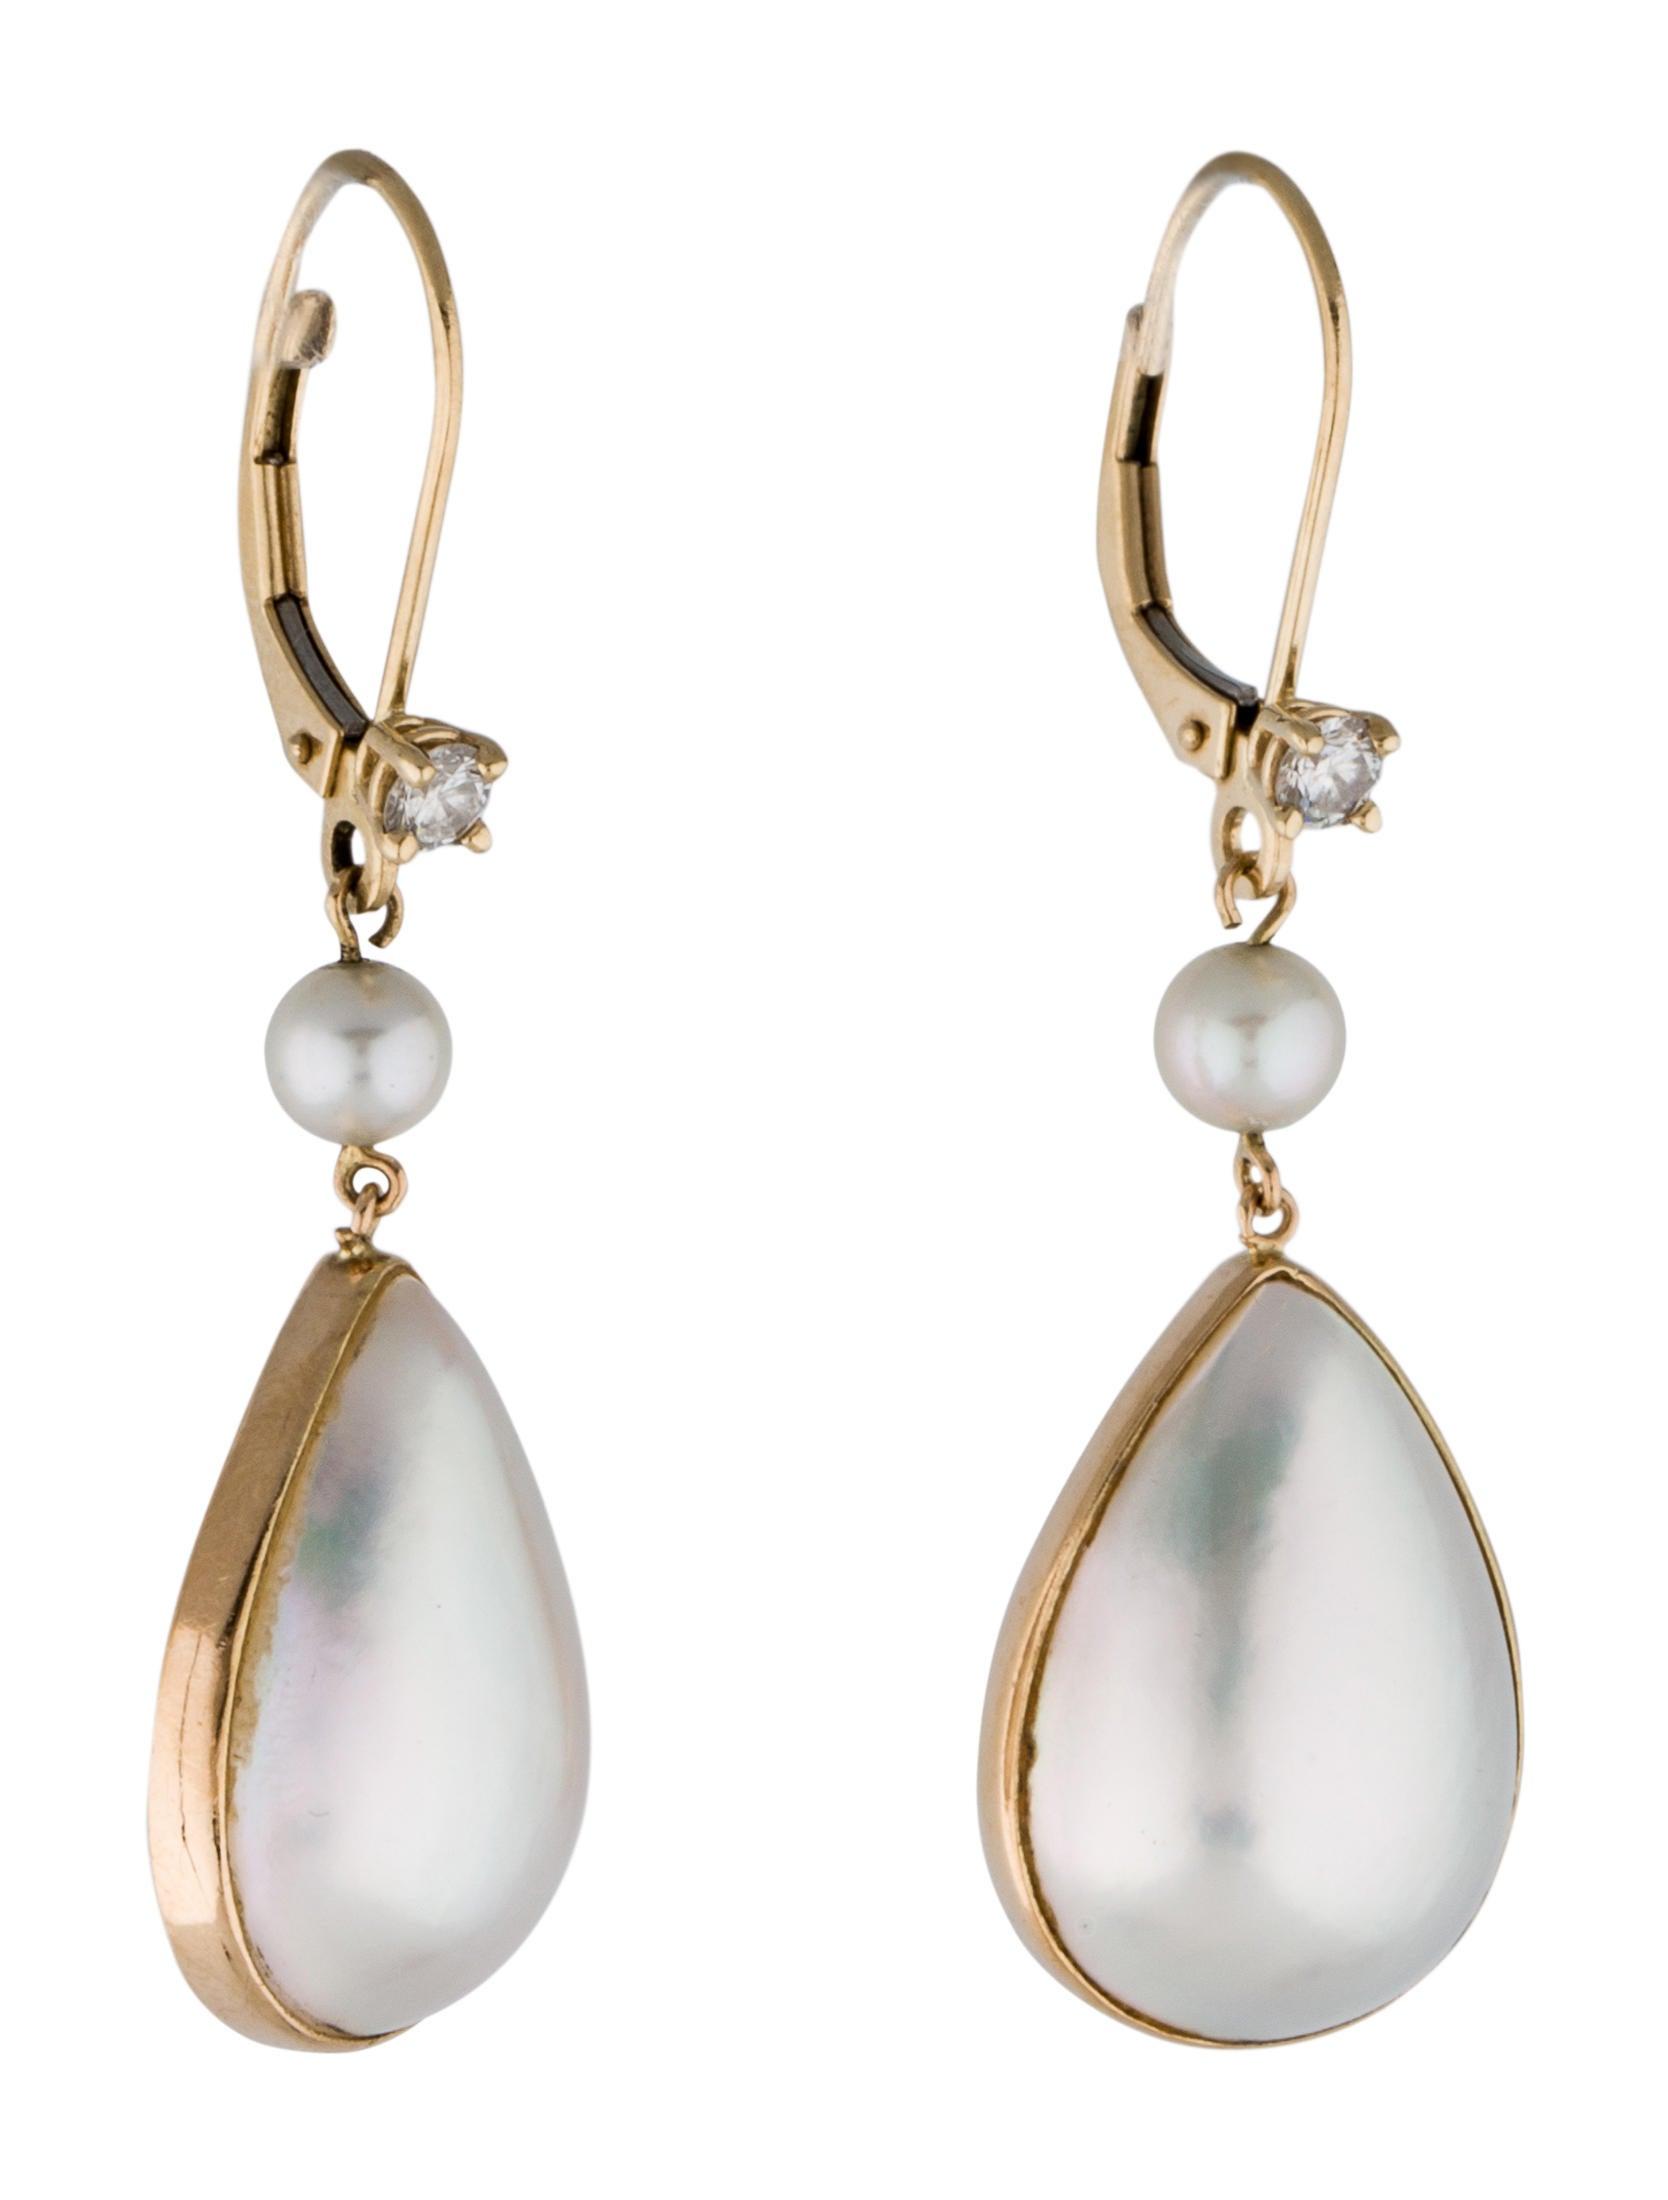 14k diamond and pearl drop earrings earrings fje26904. Black Bedroom Furniture Sets. Home Design Ideas